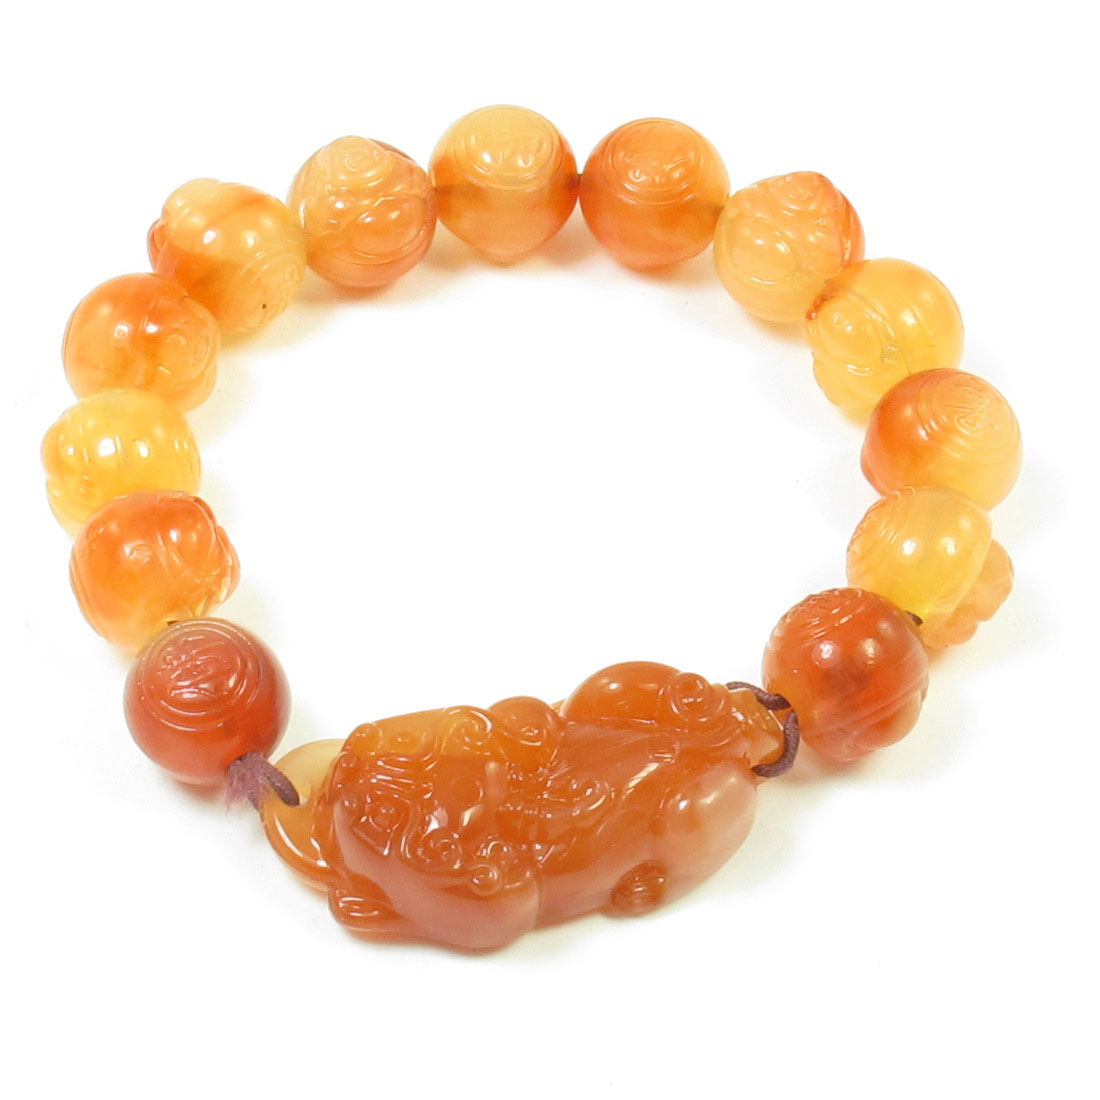 Pale Apricot Faux Jade Engraved Maitreya Buddha Beads Stretchy Wrist Bracelet